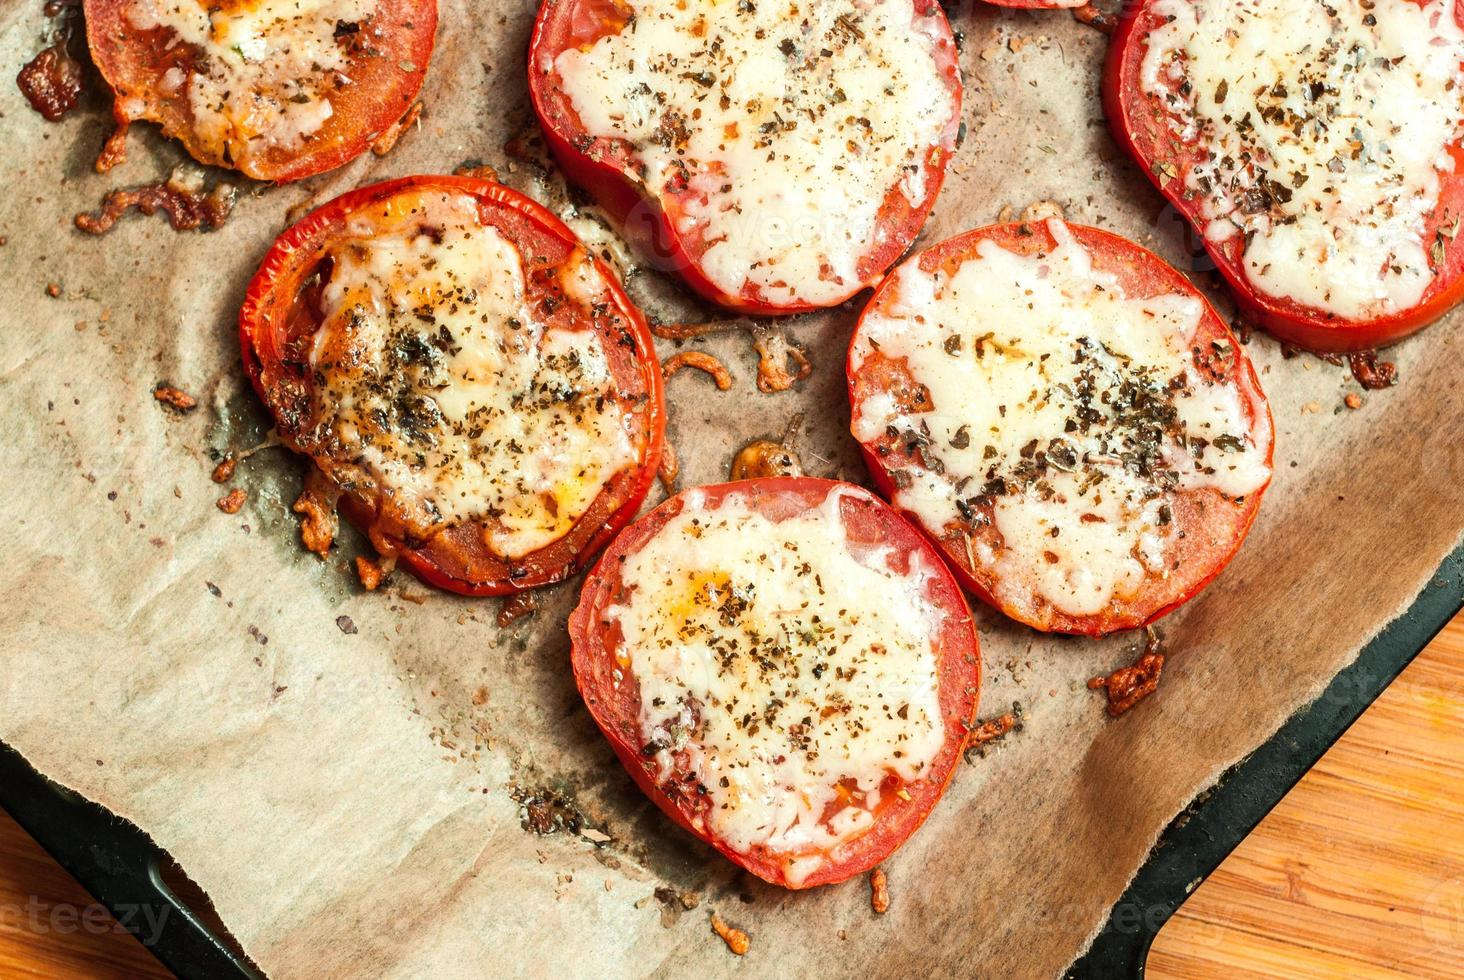 baked tomatoes photo